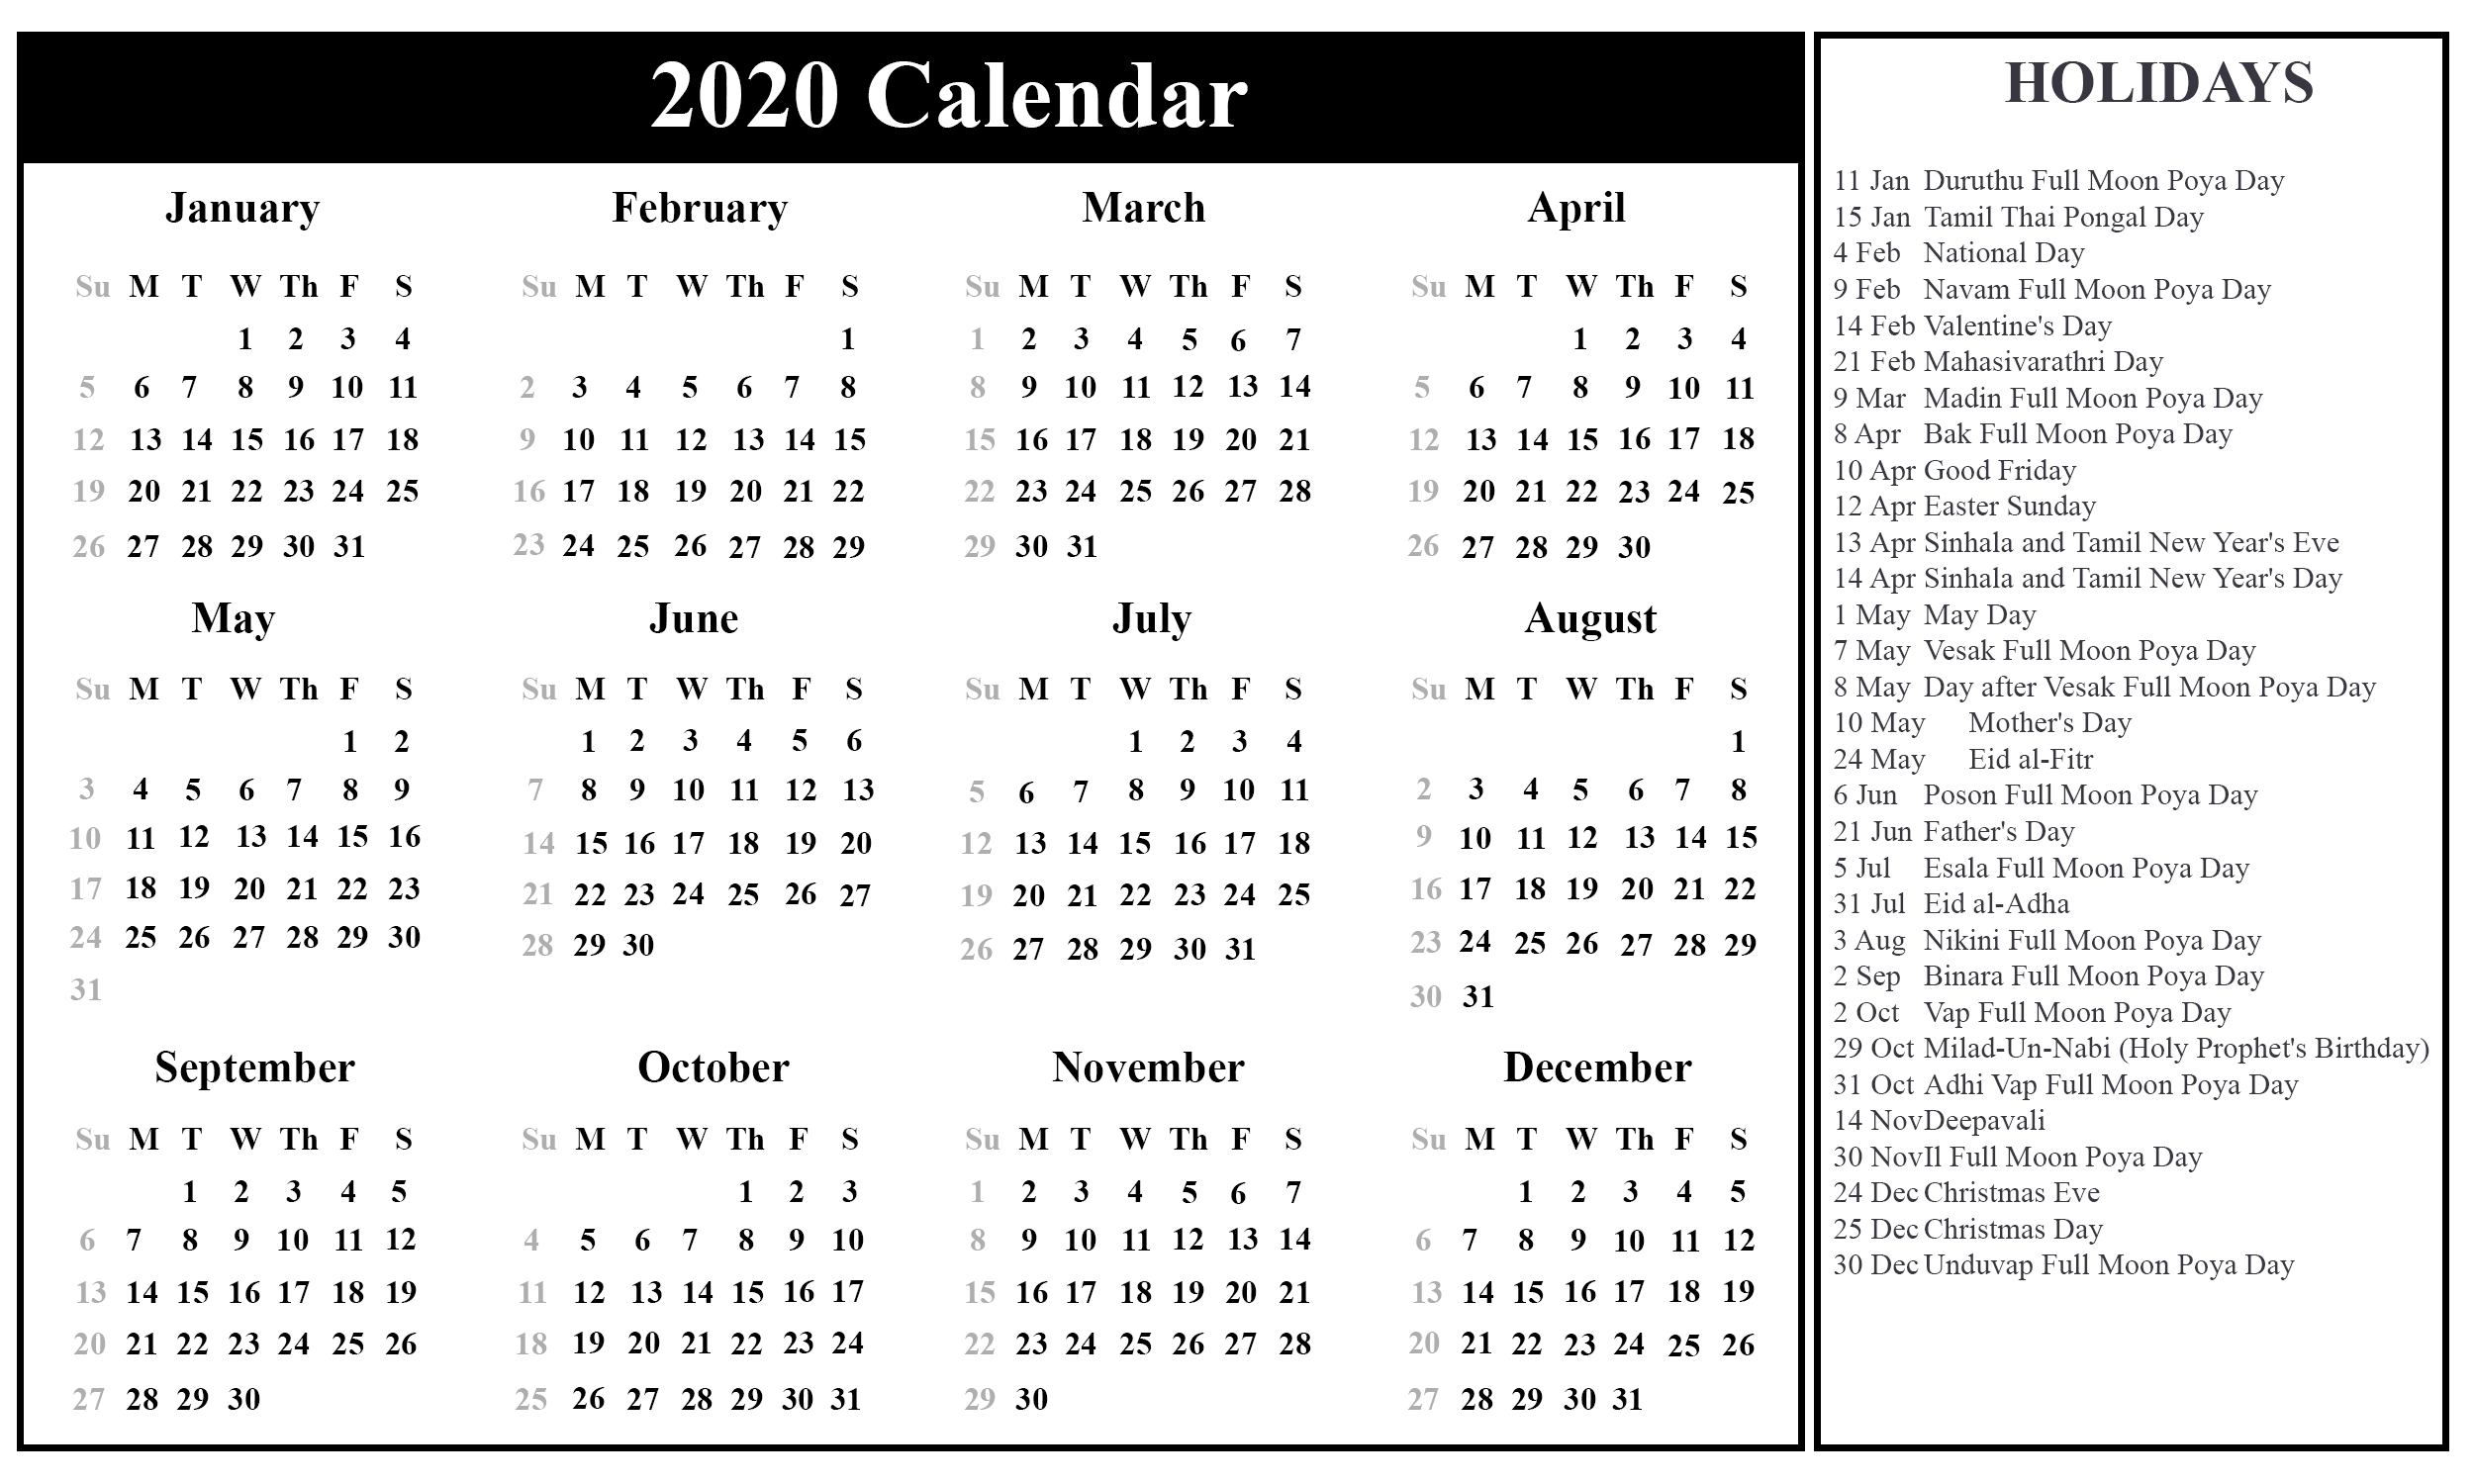 Download Free Sri Lanka Calendar 2020 In Pdf, Excel & Word-2020 Calendar Muslim Holidays